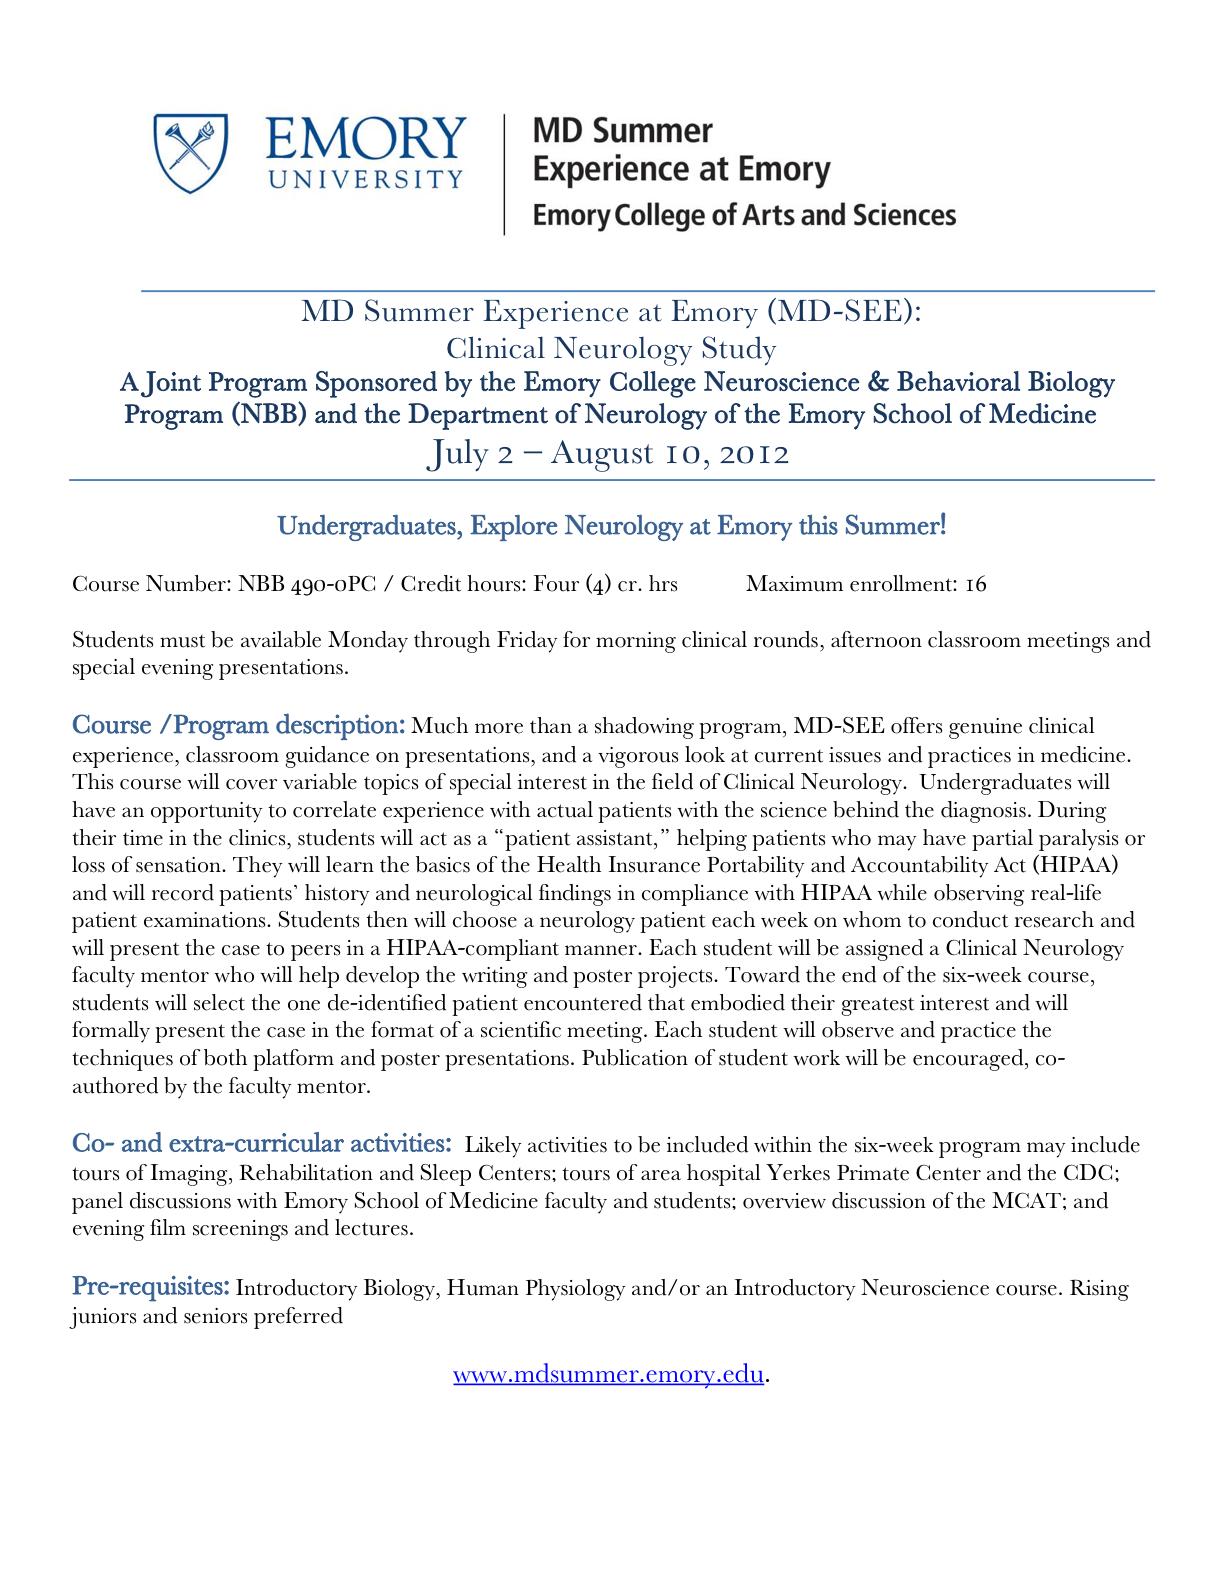 NYU OP Preprofessional Bulletin: MD Summer Experience at Emory